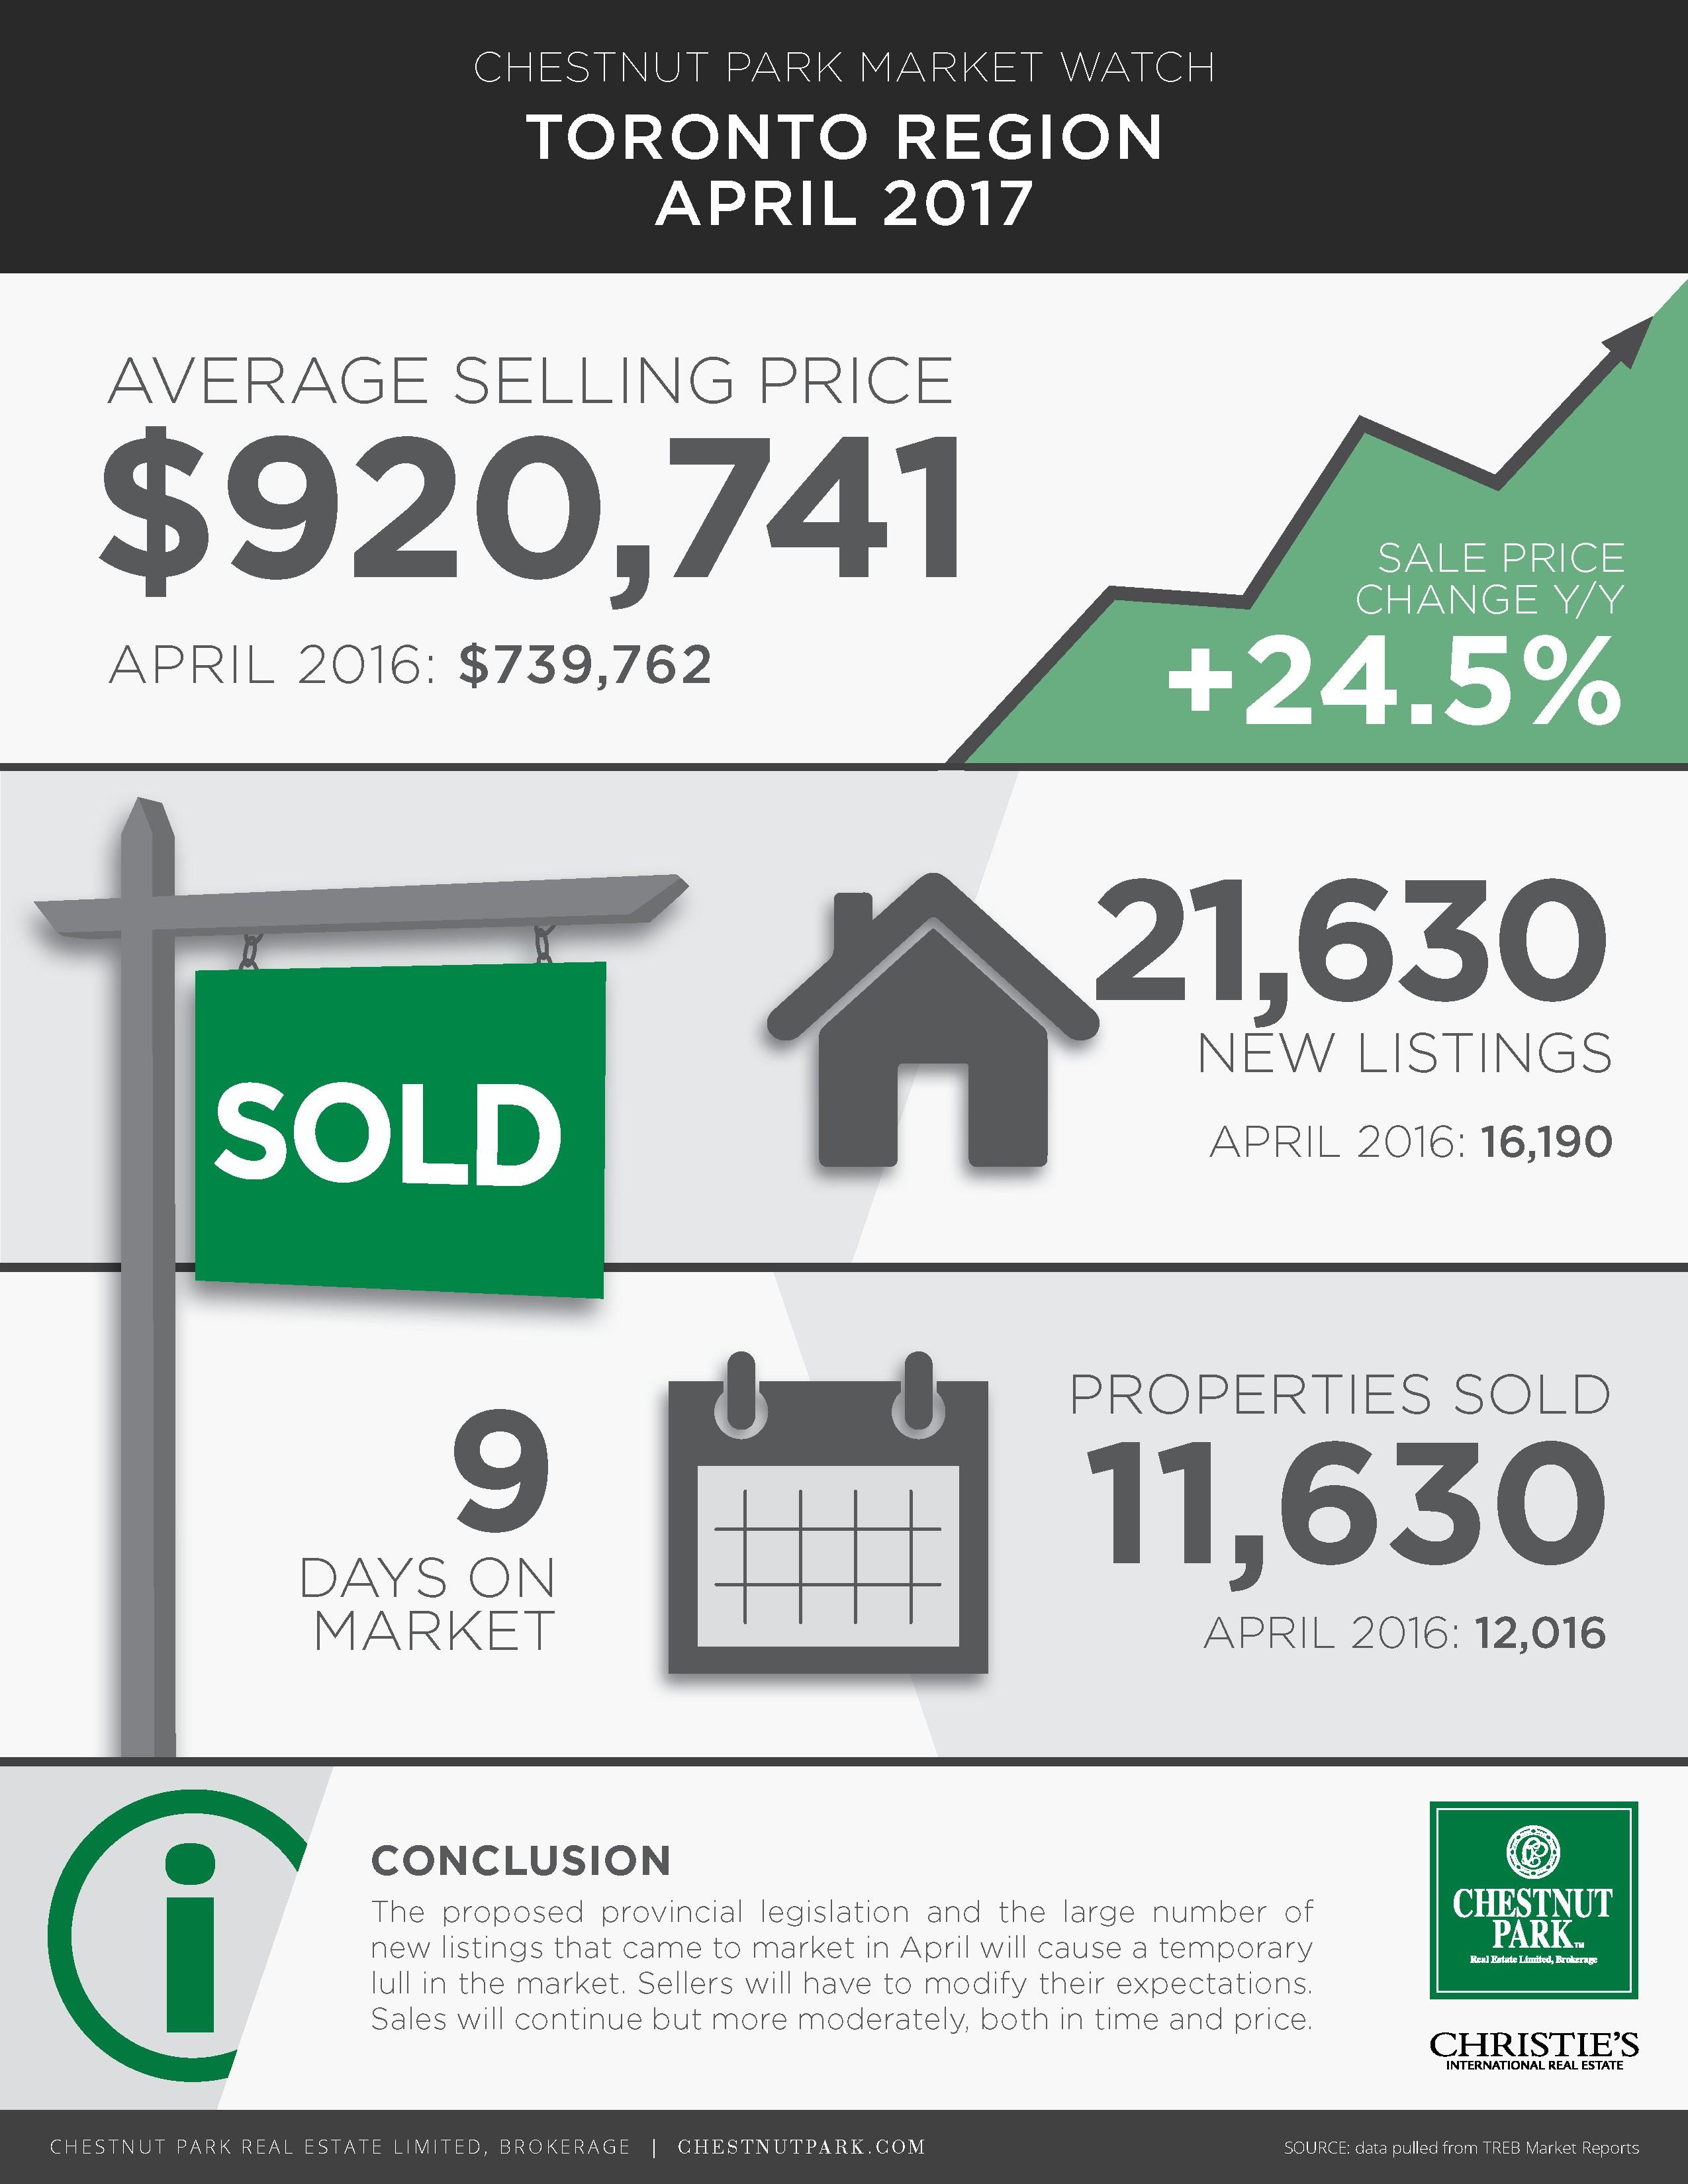 Toronto Real Estate Market Analysis by Chestnut Park Real Estate – Real Estate Market Analysis